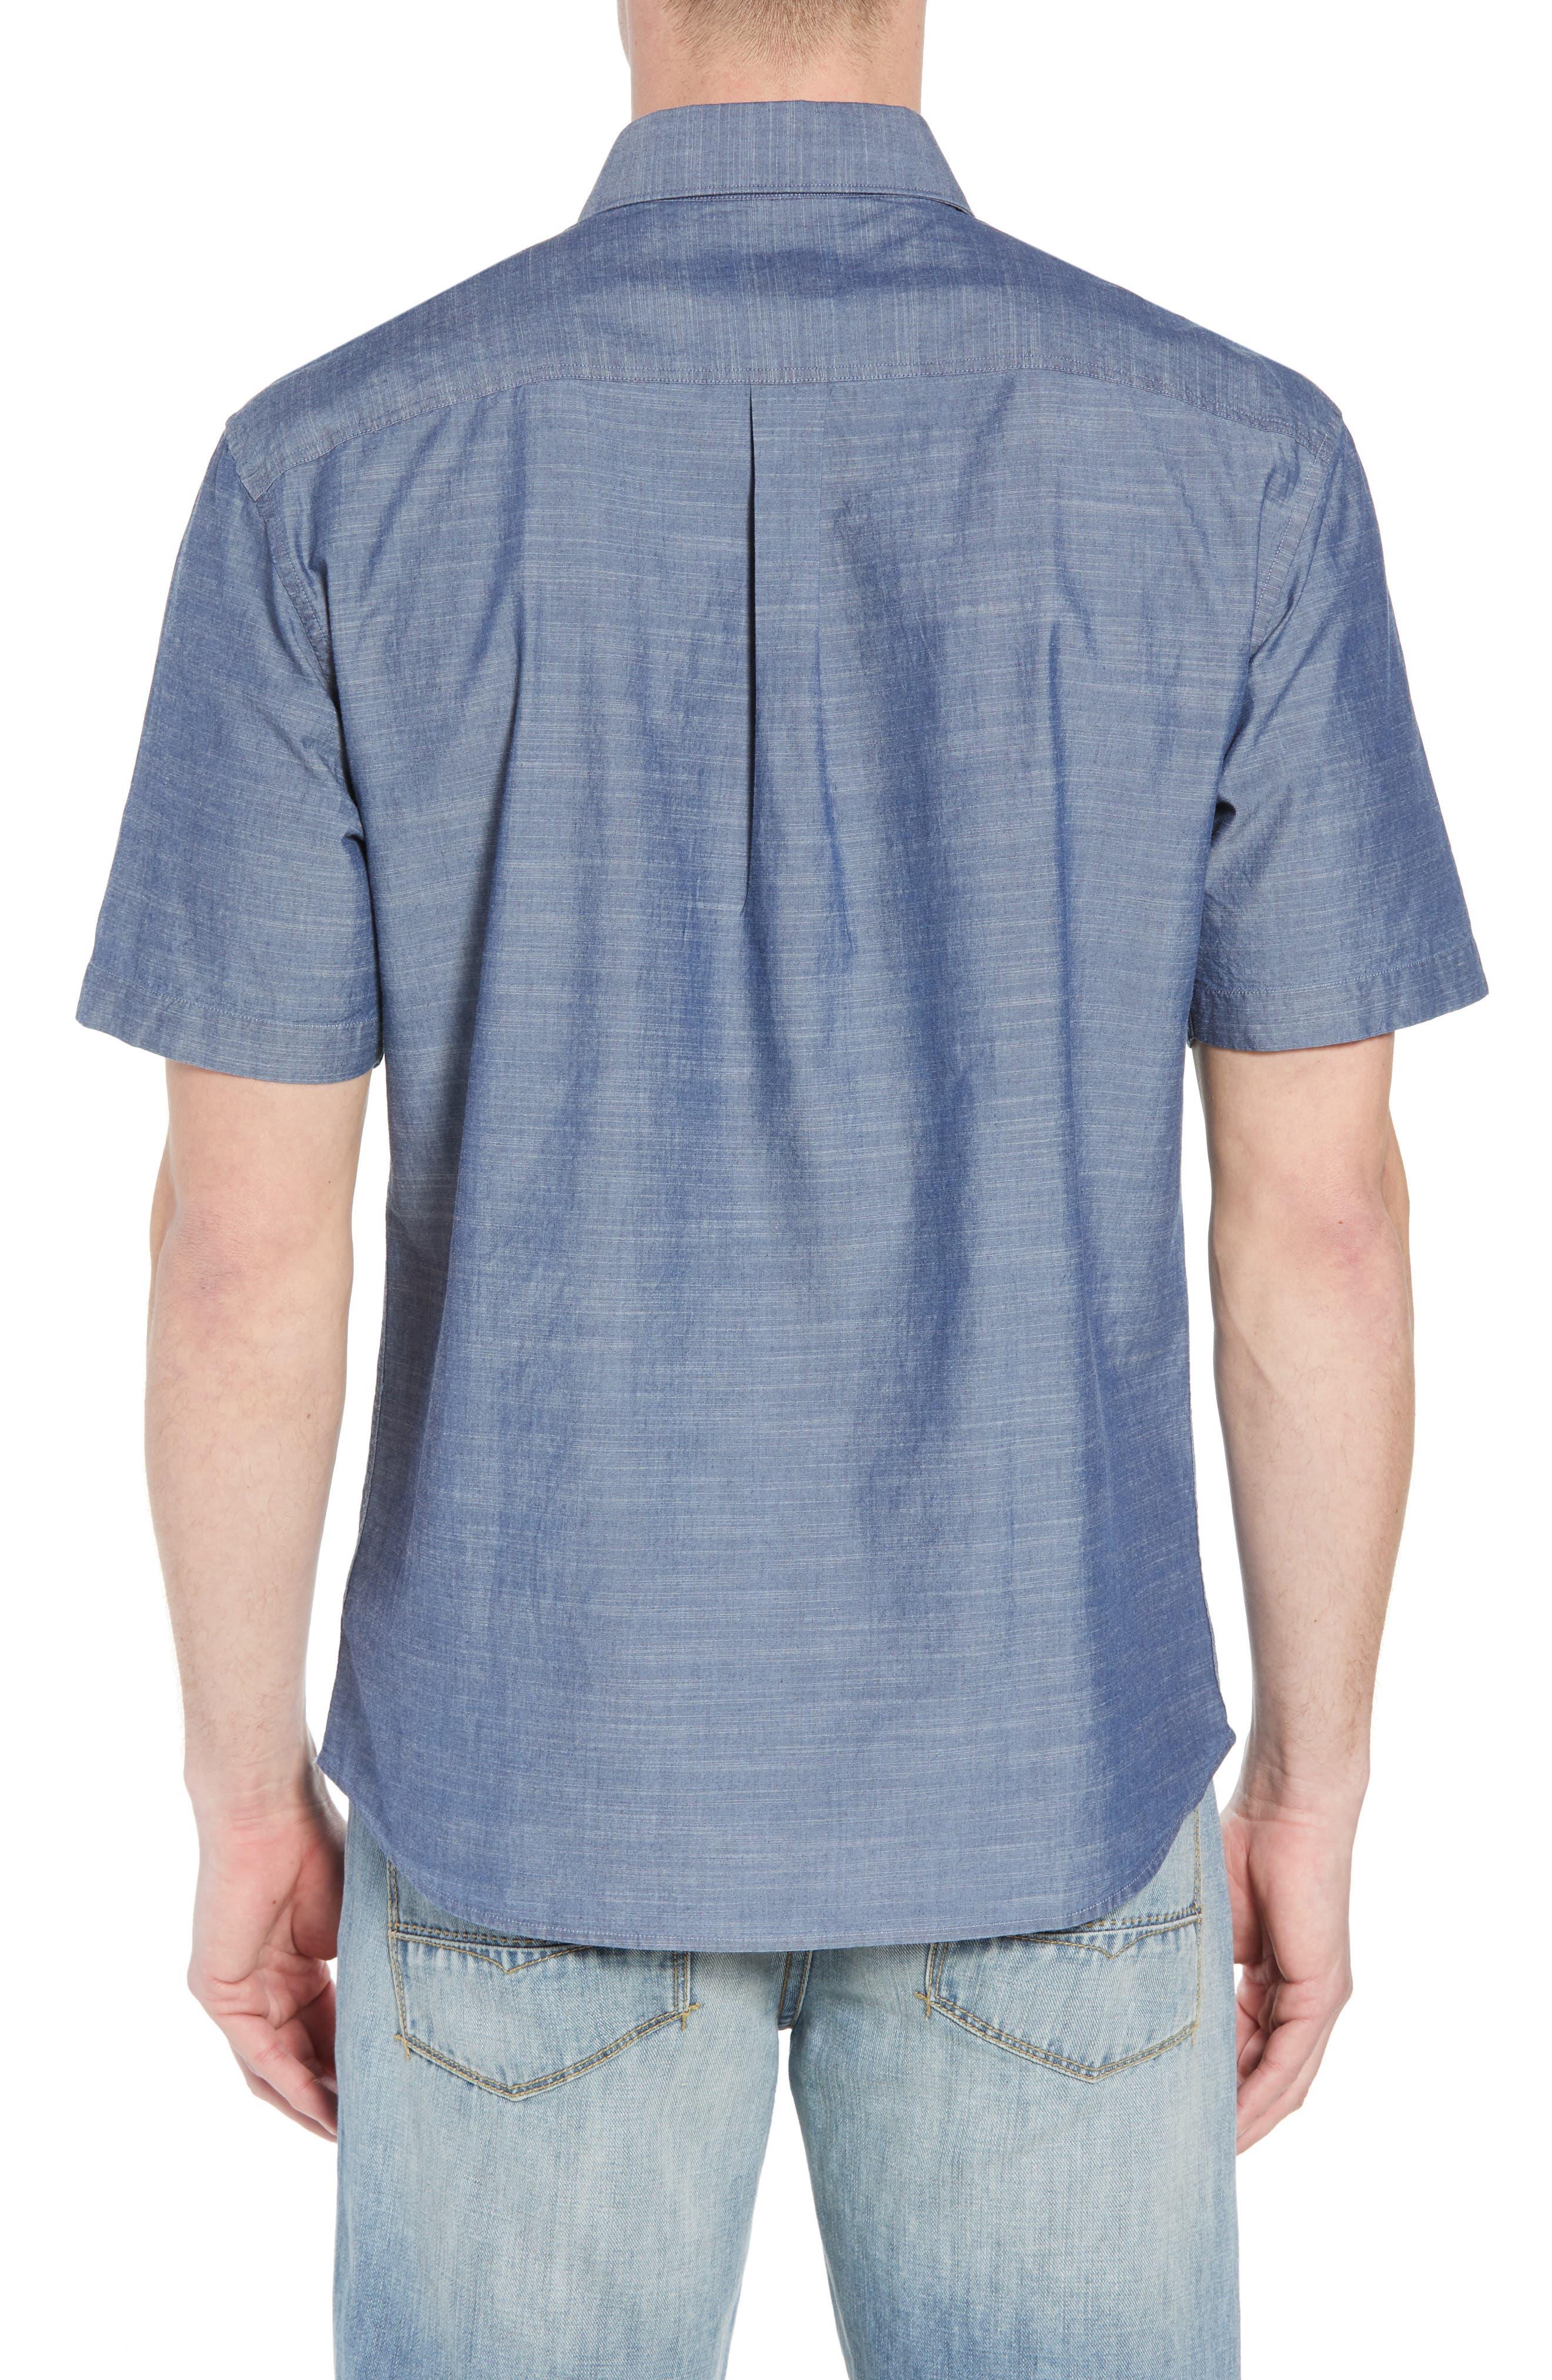 Lucas Regular Fit Chambray Sport Shirt,                             Alternate thumbnail 2, color,                             403